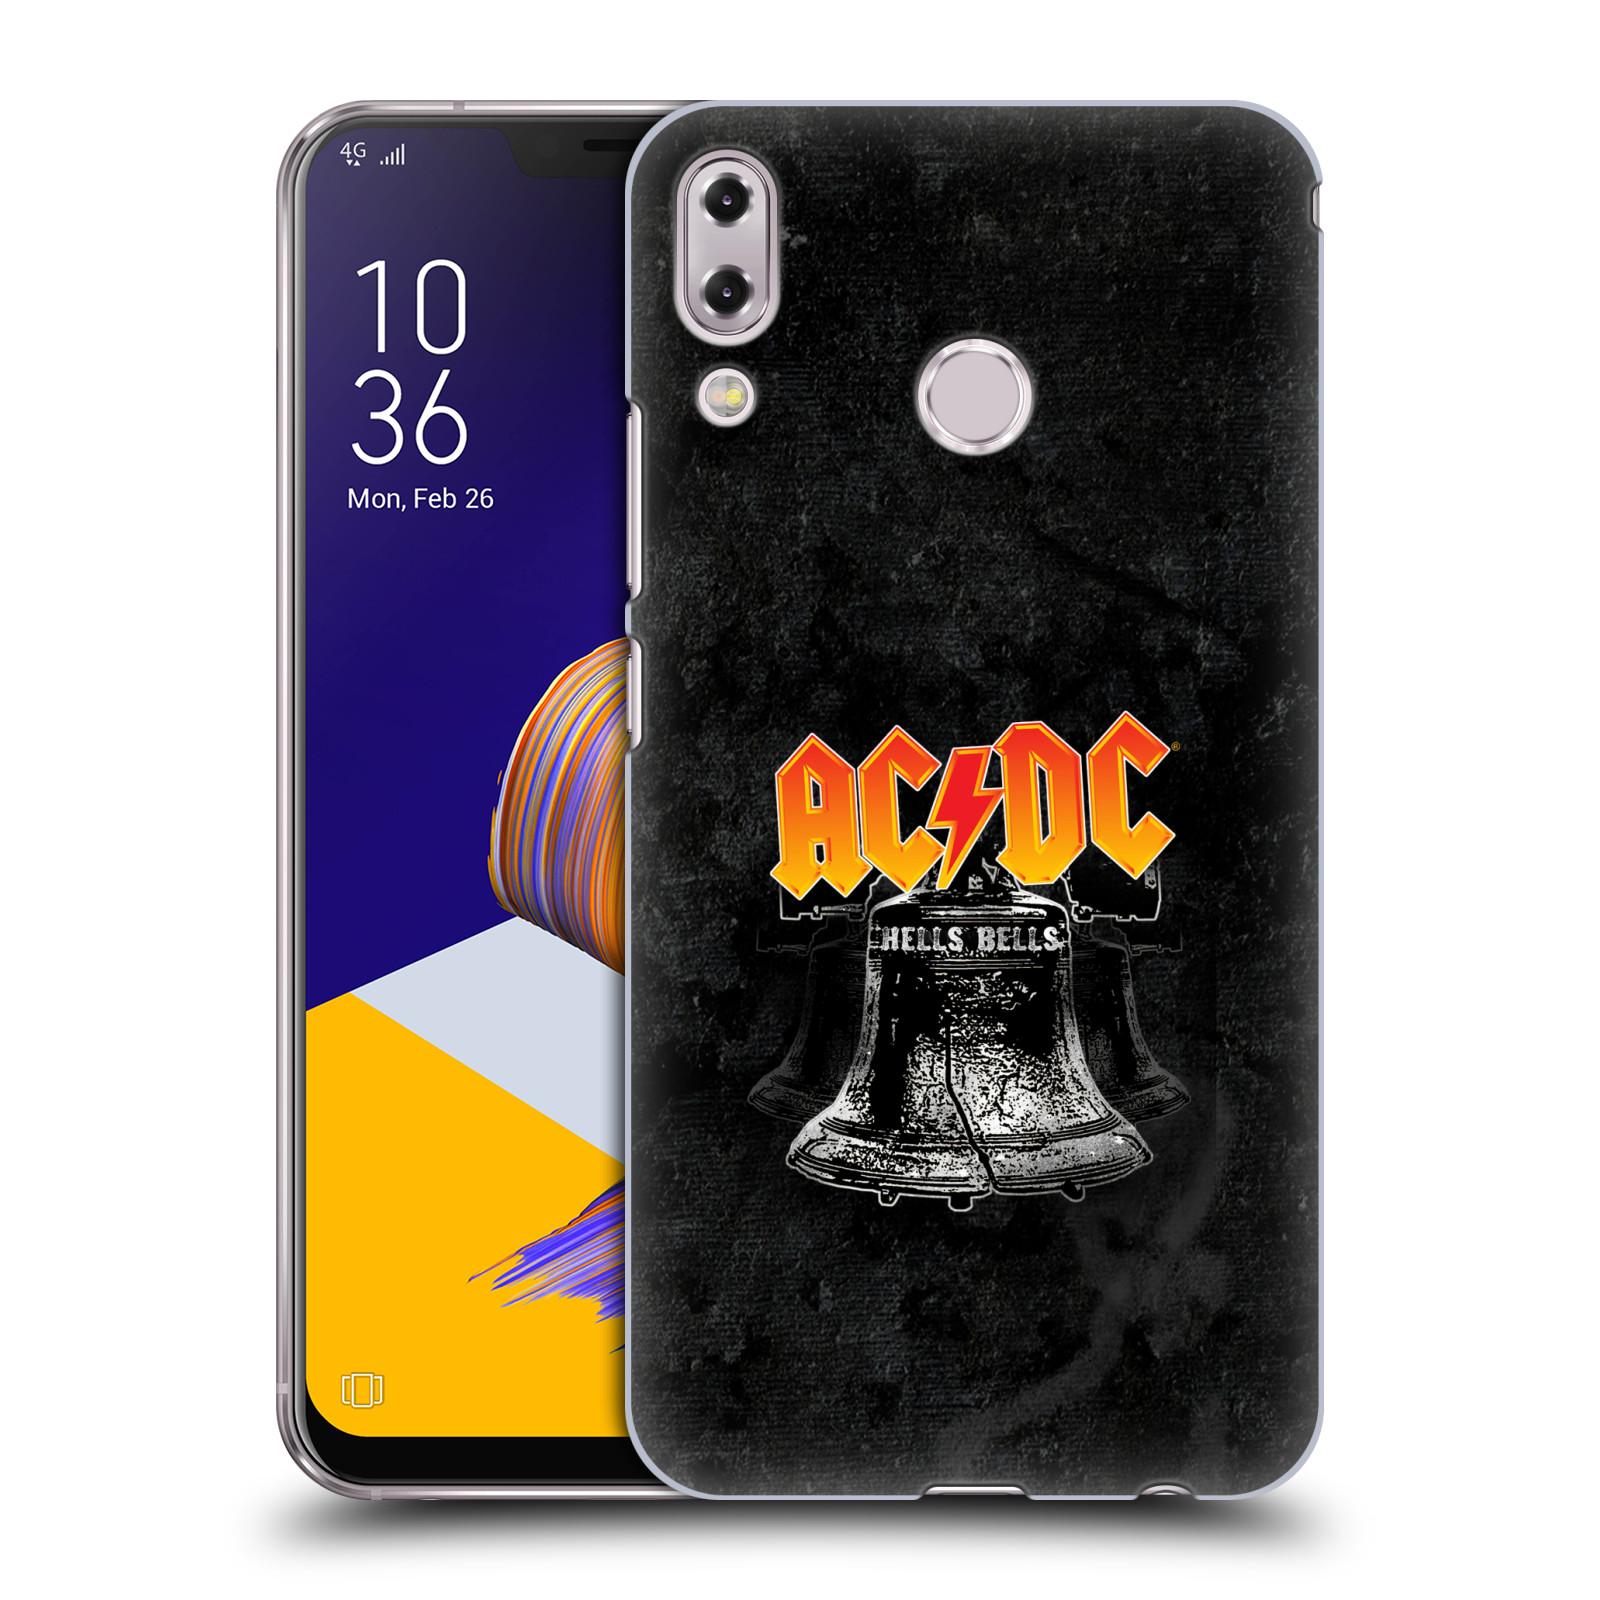 Plastové pouzdro na mobil Asus Zenfone 5z ZS620KL - Head Case - AC/DC Hells Bells